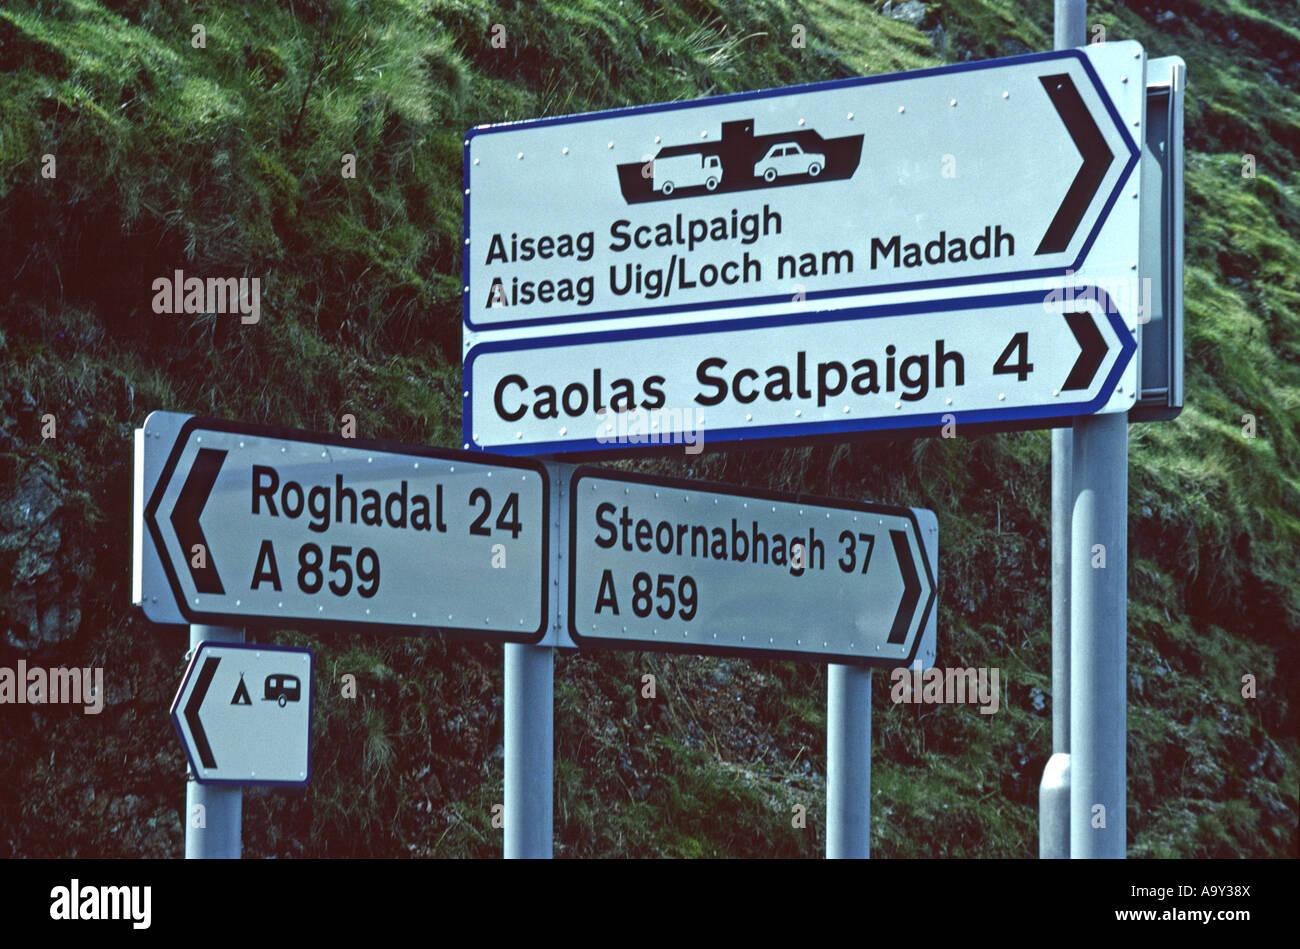 Road signs in Gaelic. Tarbert, Harris, Outer Hebrides, Scotland, U.K., Europe. - Stock Image